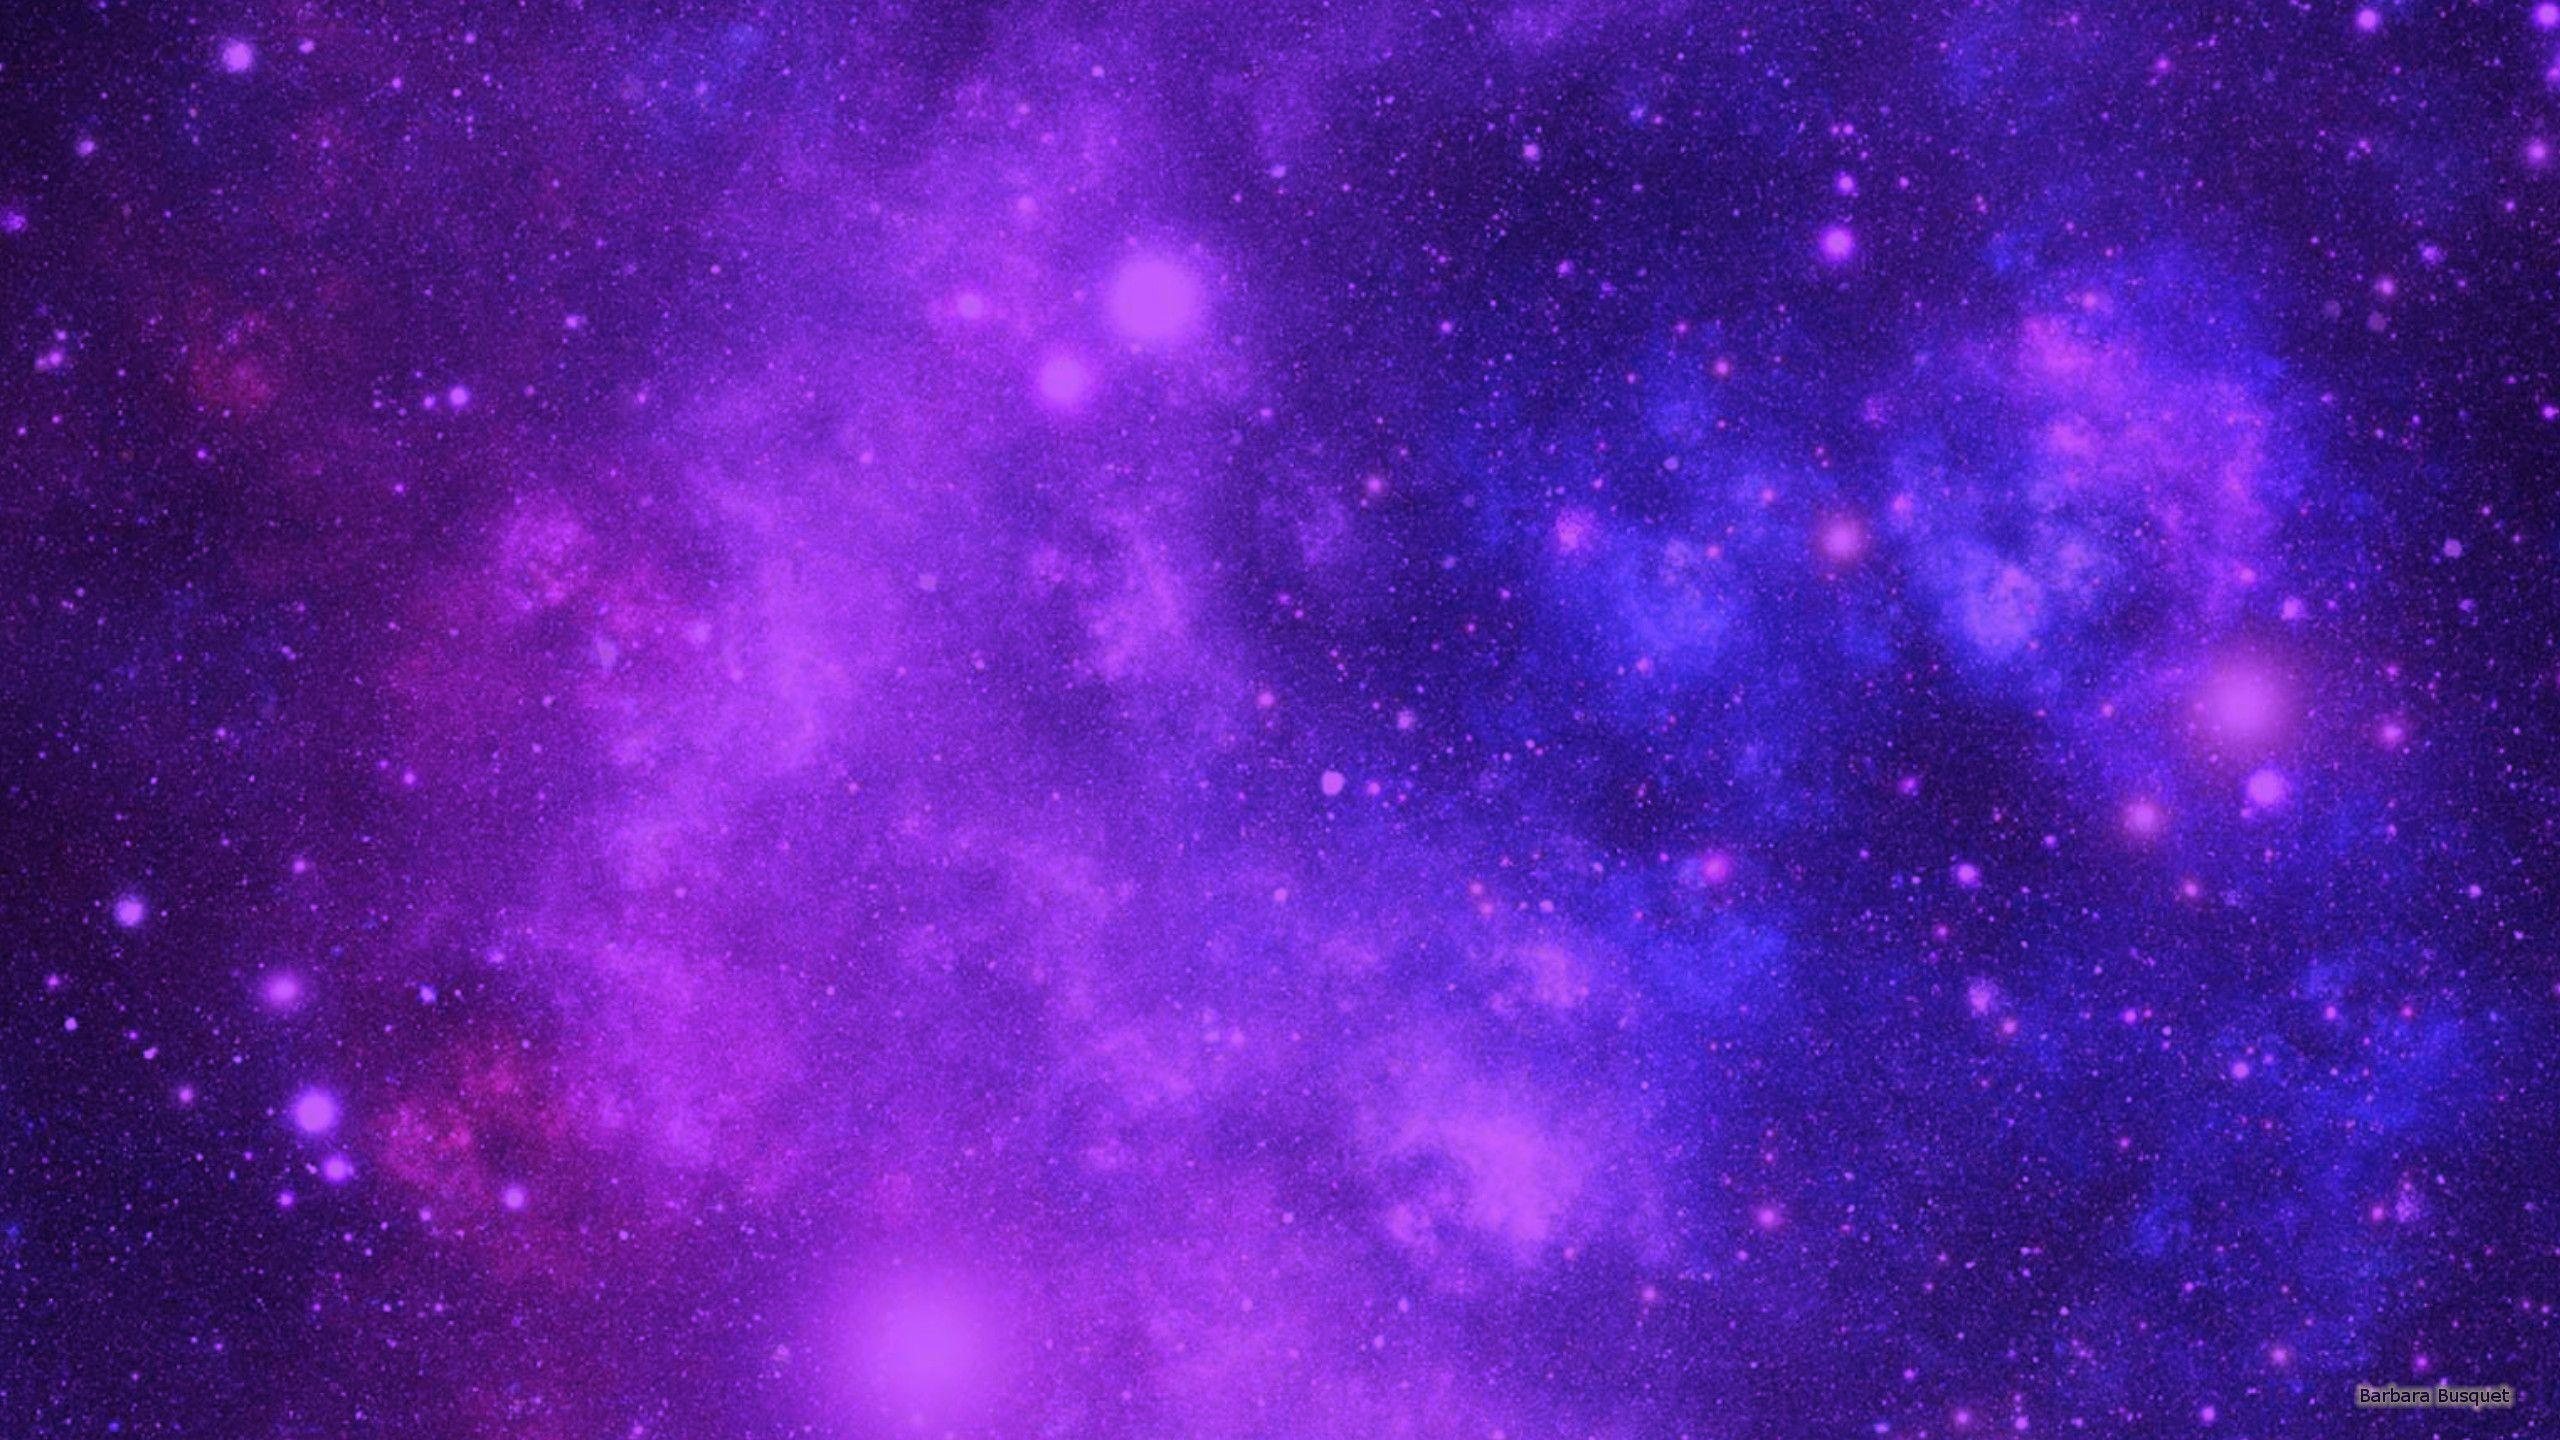 Pin By Lorena Lopez On Portadas 1 Galaxy Wallpaper Blue Galaxy Wallpaper Purple Galaxy Wallpaper